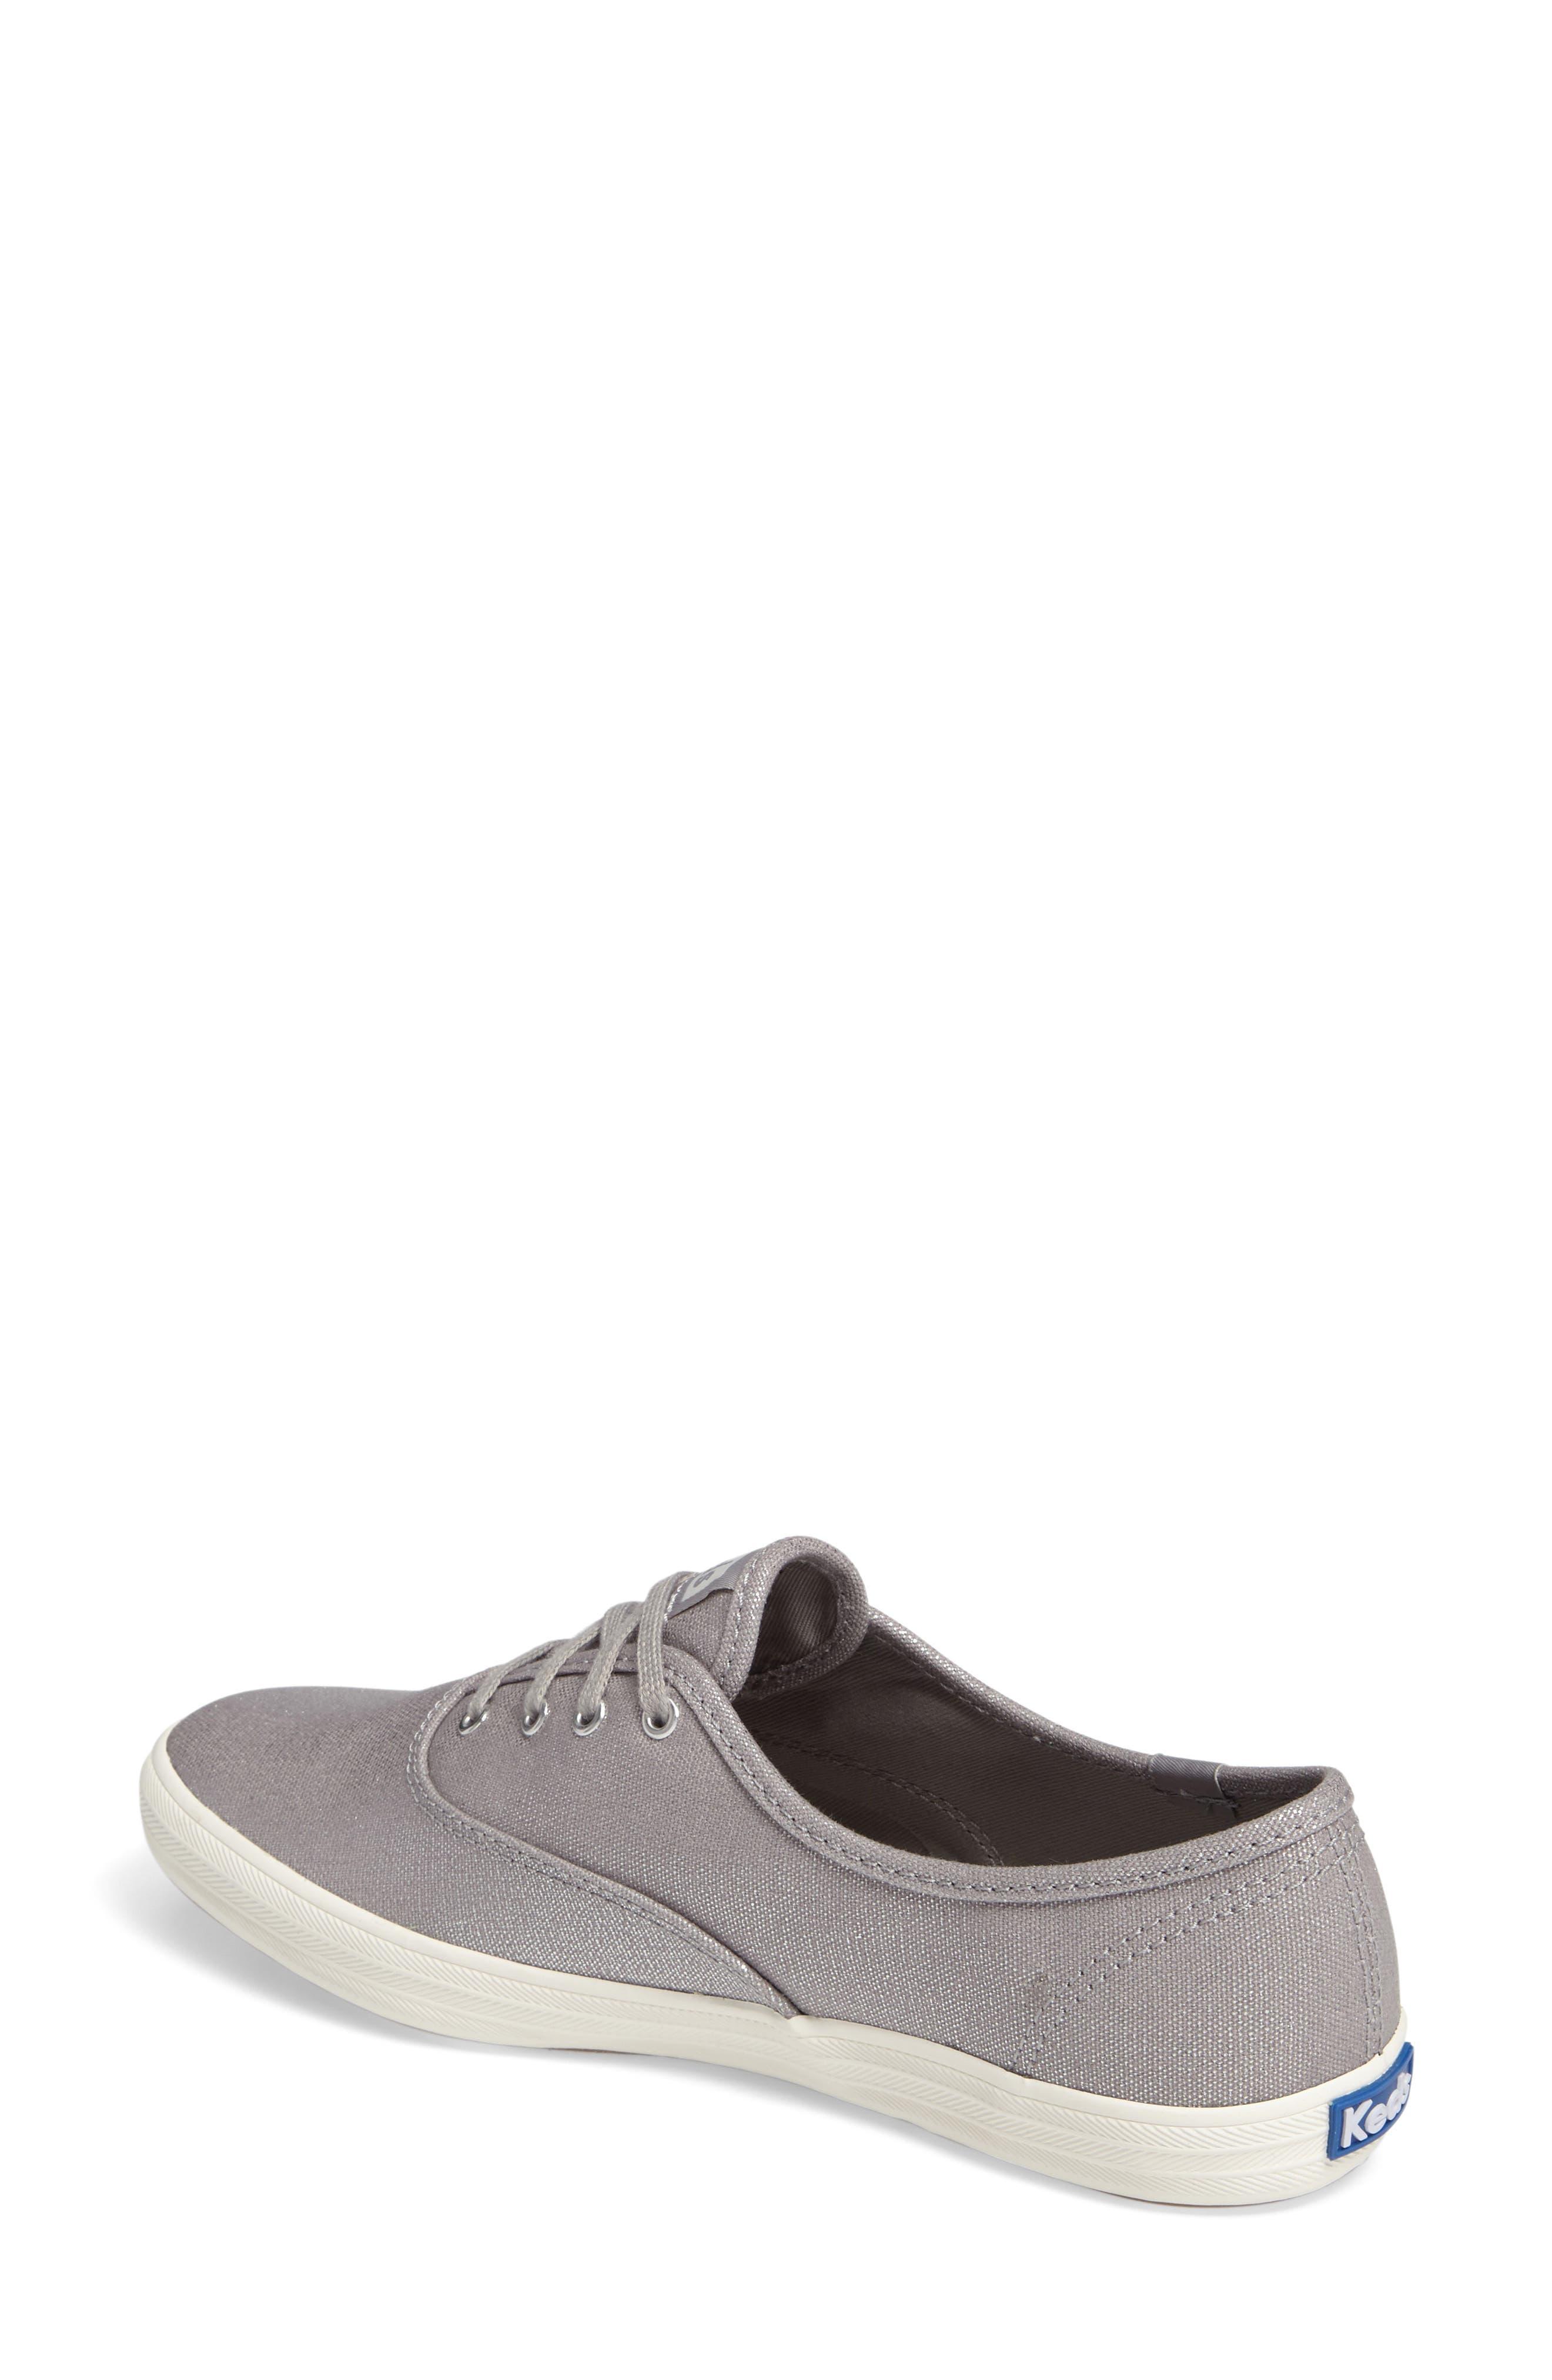 Champion Sneaker,                             Alternate thumbnail 2, color,                             040